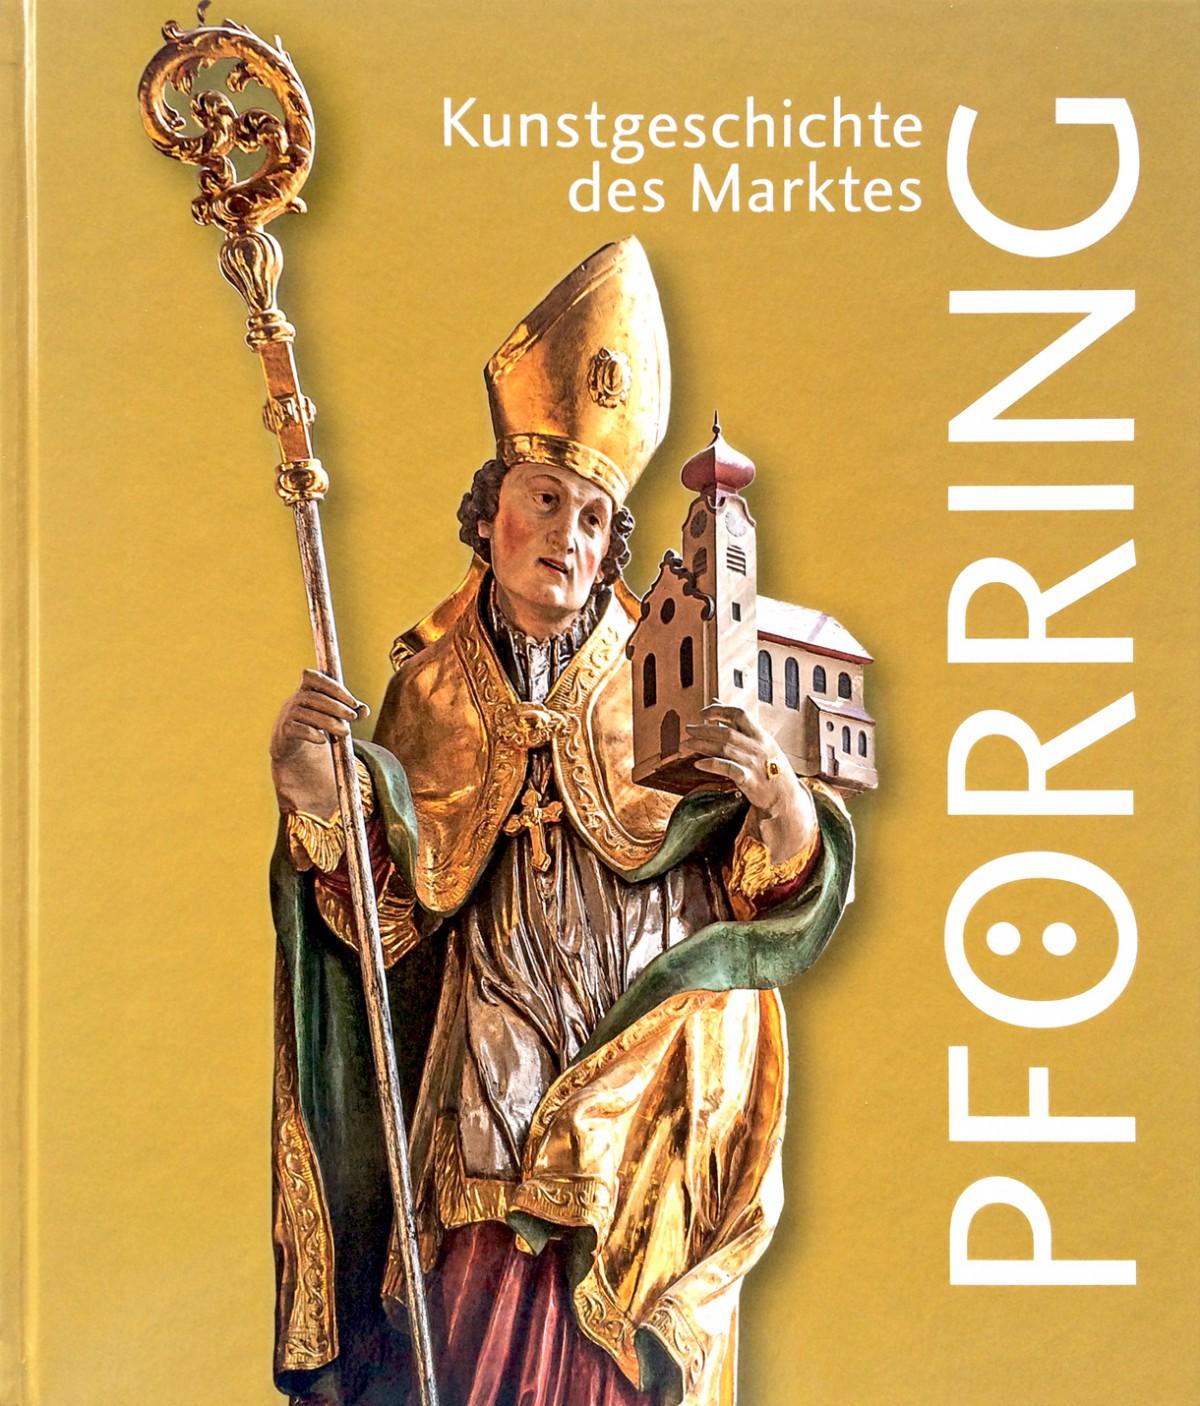 Vogl Wolfgang - Kunstgeschichte des Marktes Pförring